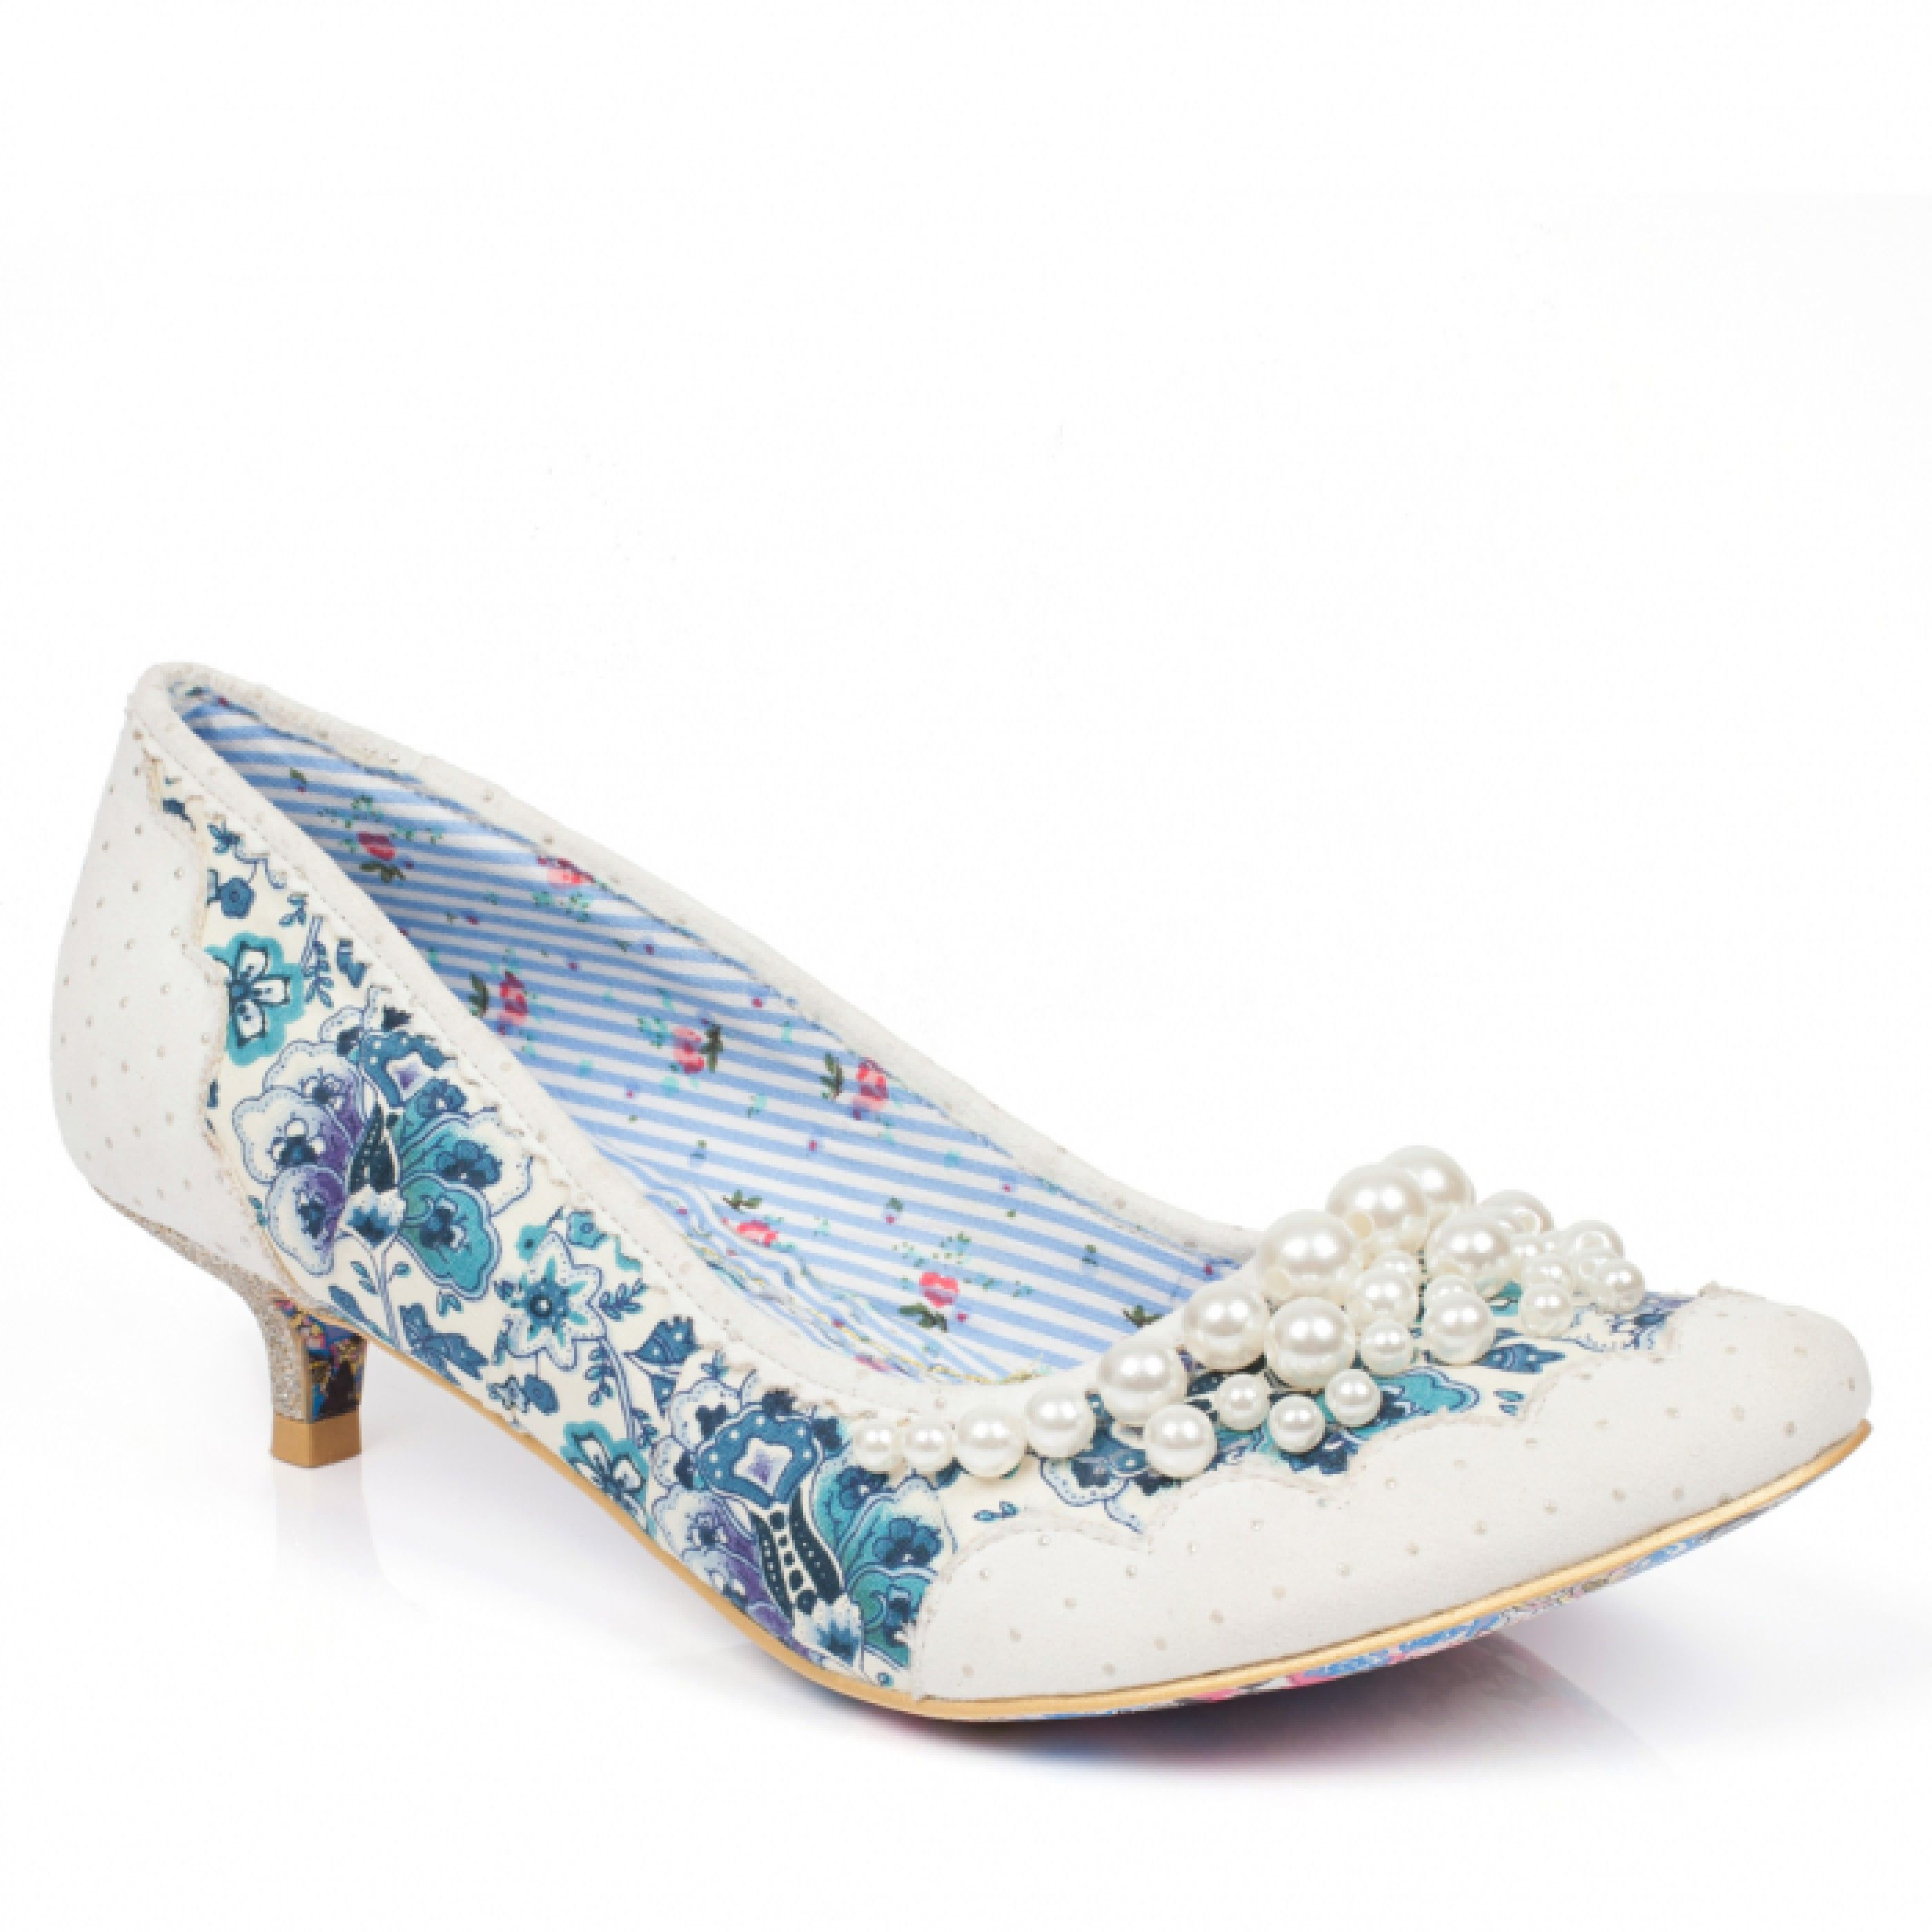 ace8c6aa123 Pearly Girly Low. Irregular Choice Pearly Girly Low Irregular Choice Shoes